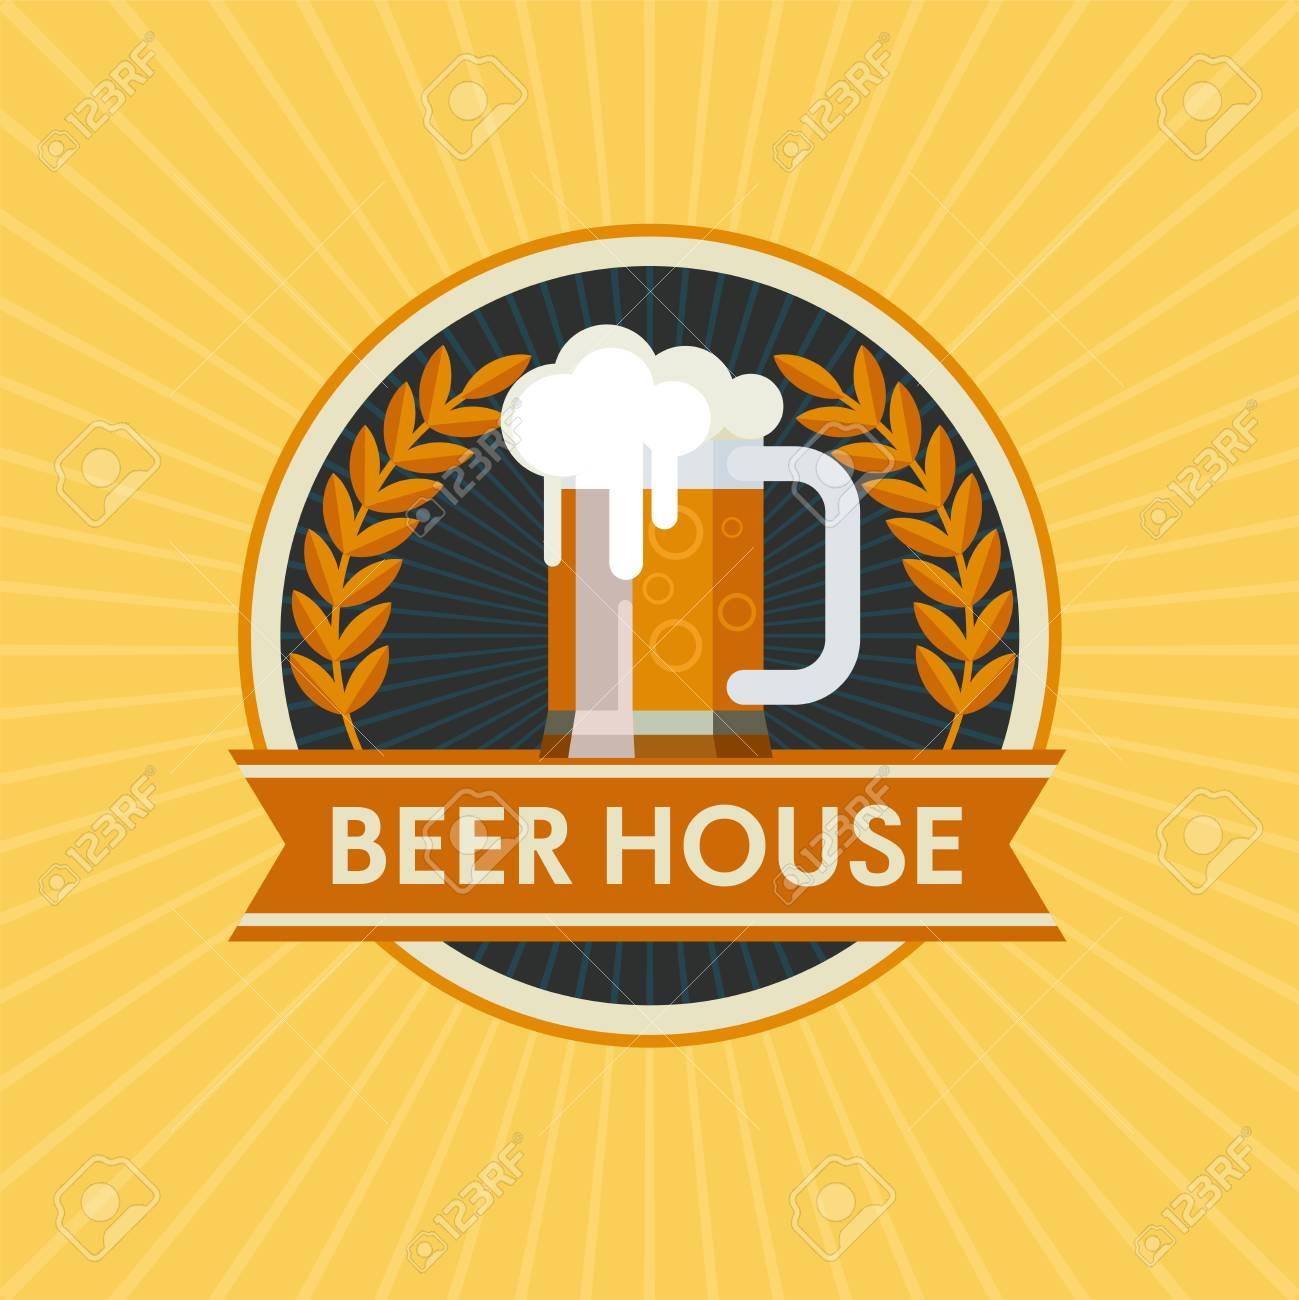 Beer Bottle Stock Illustrations – 52,006 Beer Bottle Stock Illustrations,  Vectors & Clipart - Dreamstime